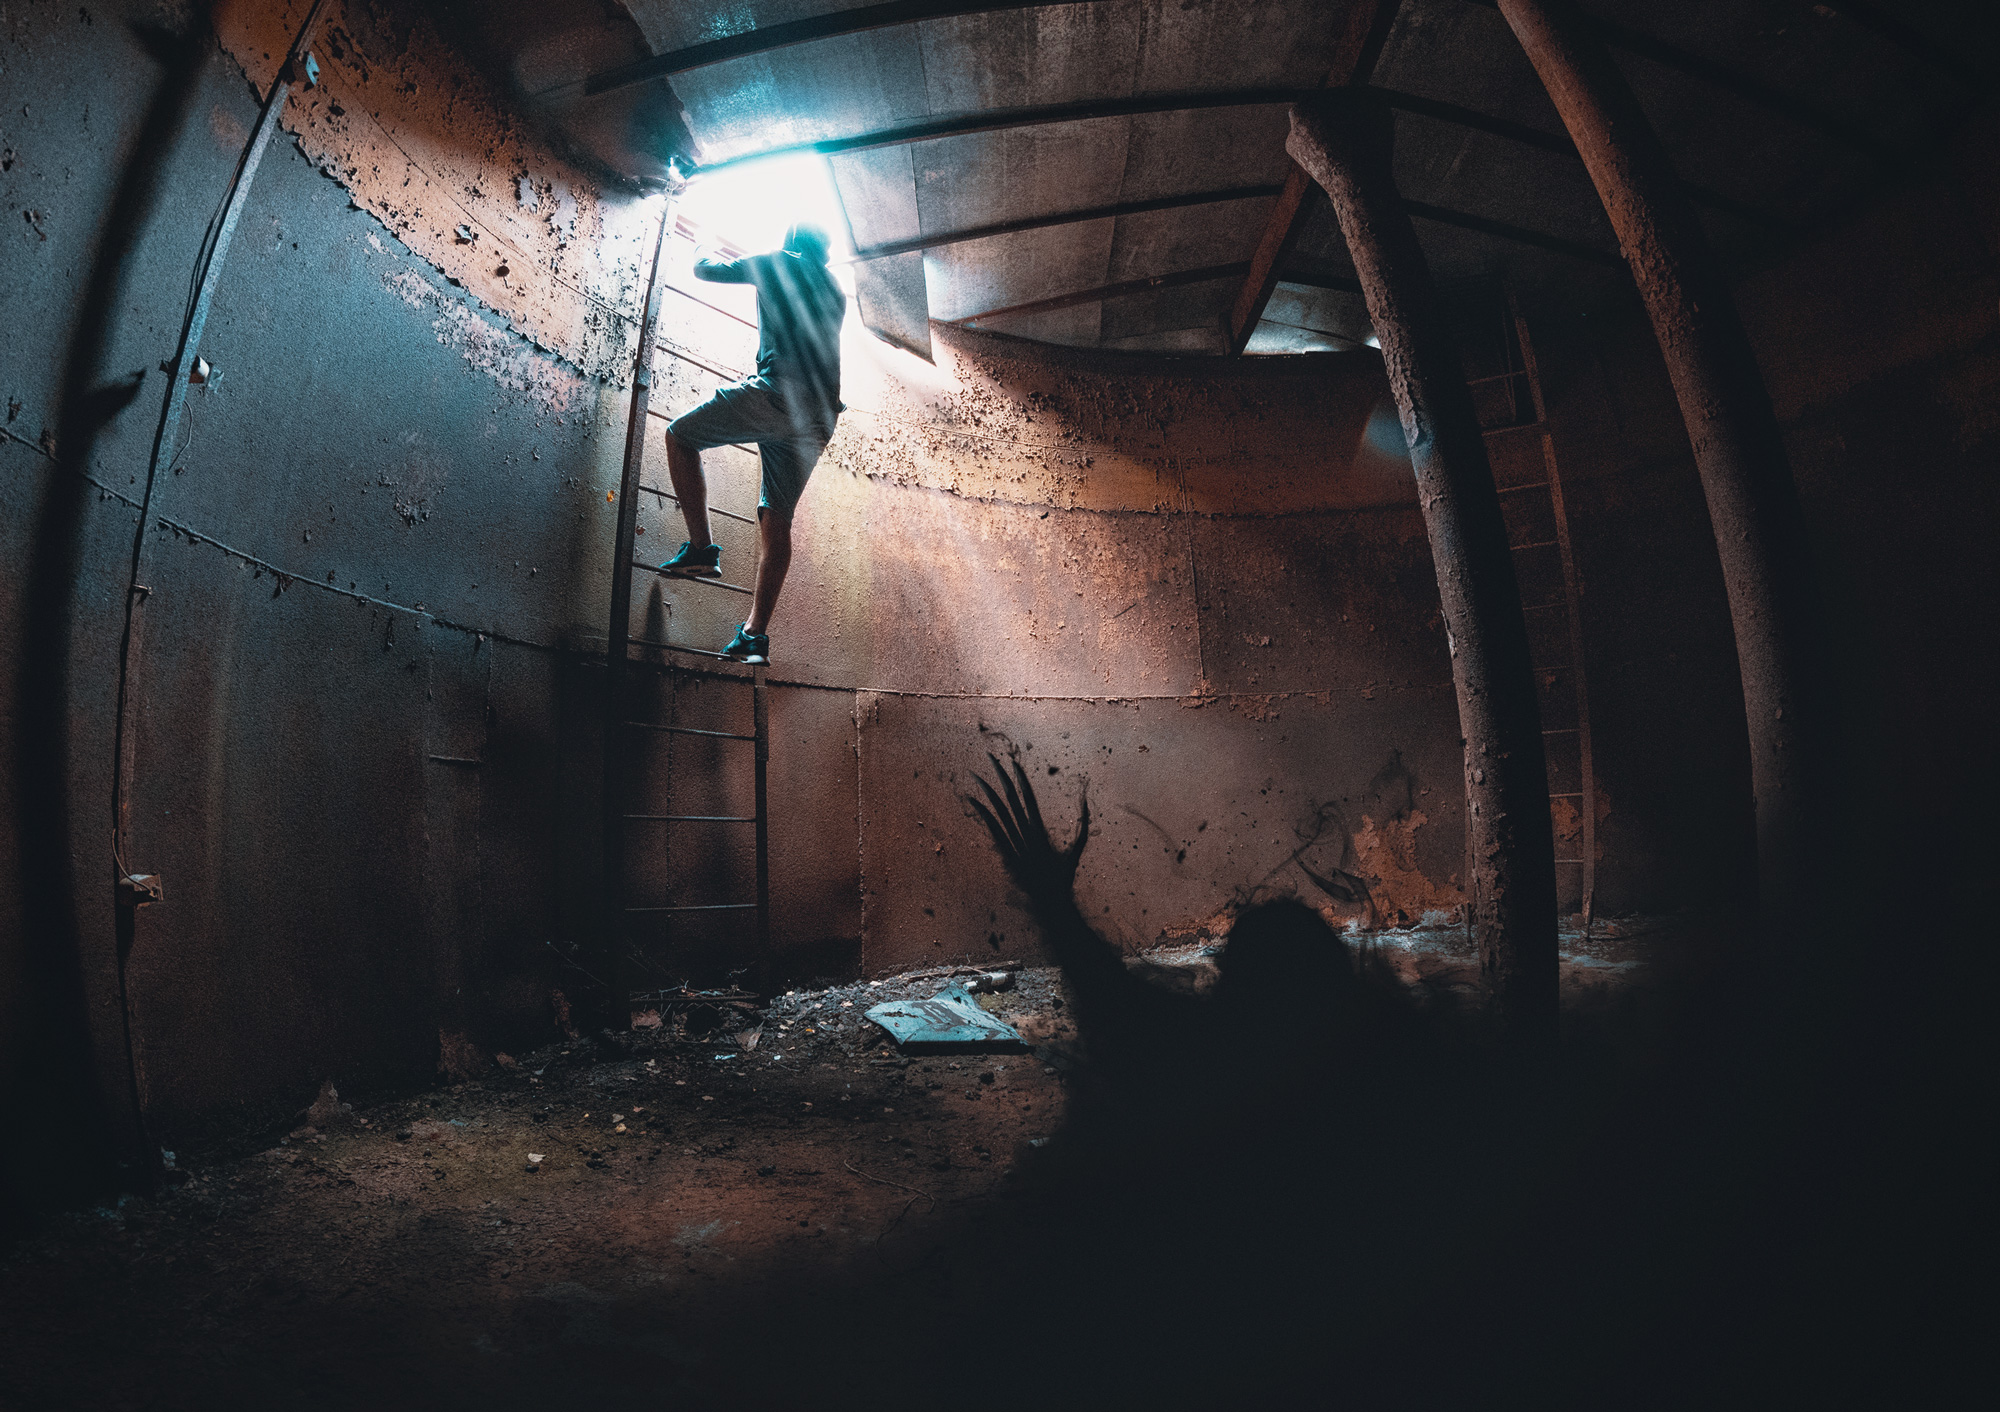 escape-the-darkness.jpg